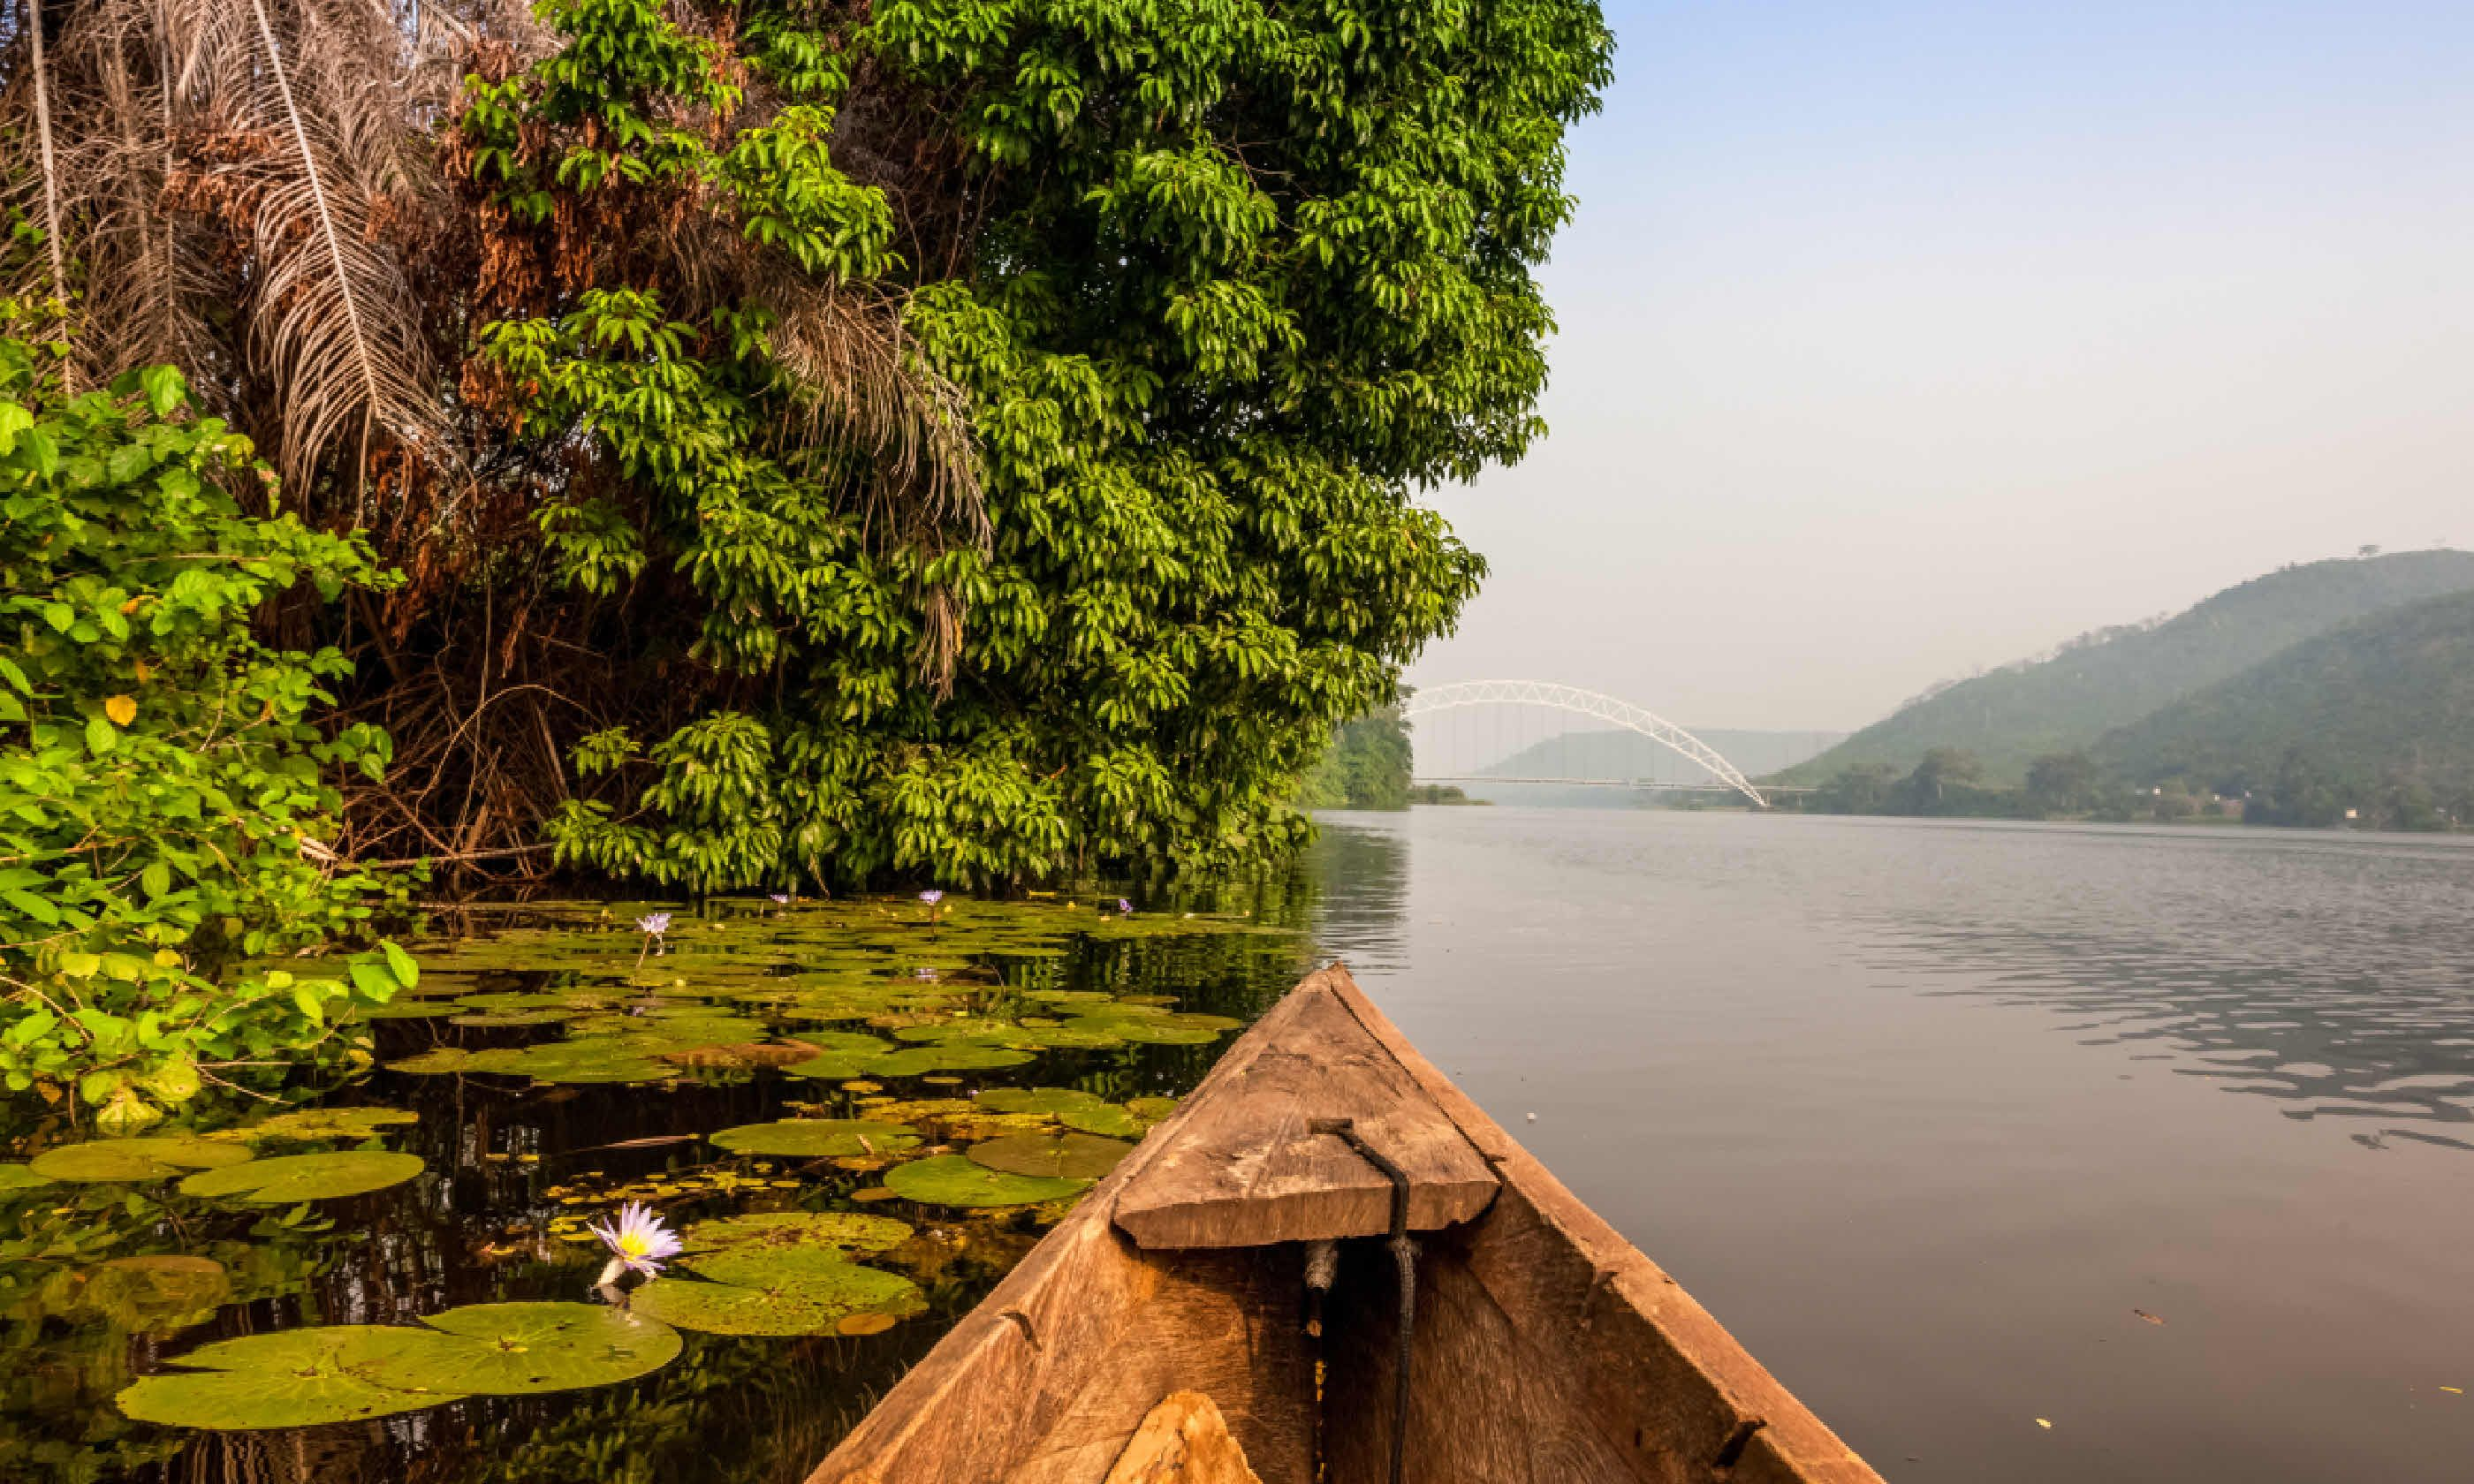 Ghana, Africa (Shutterstock)